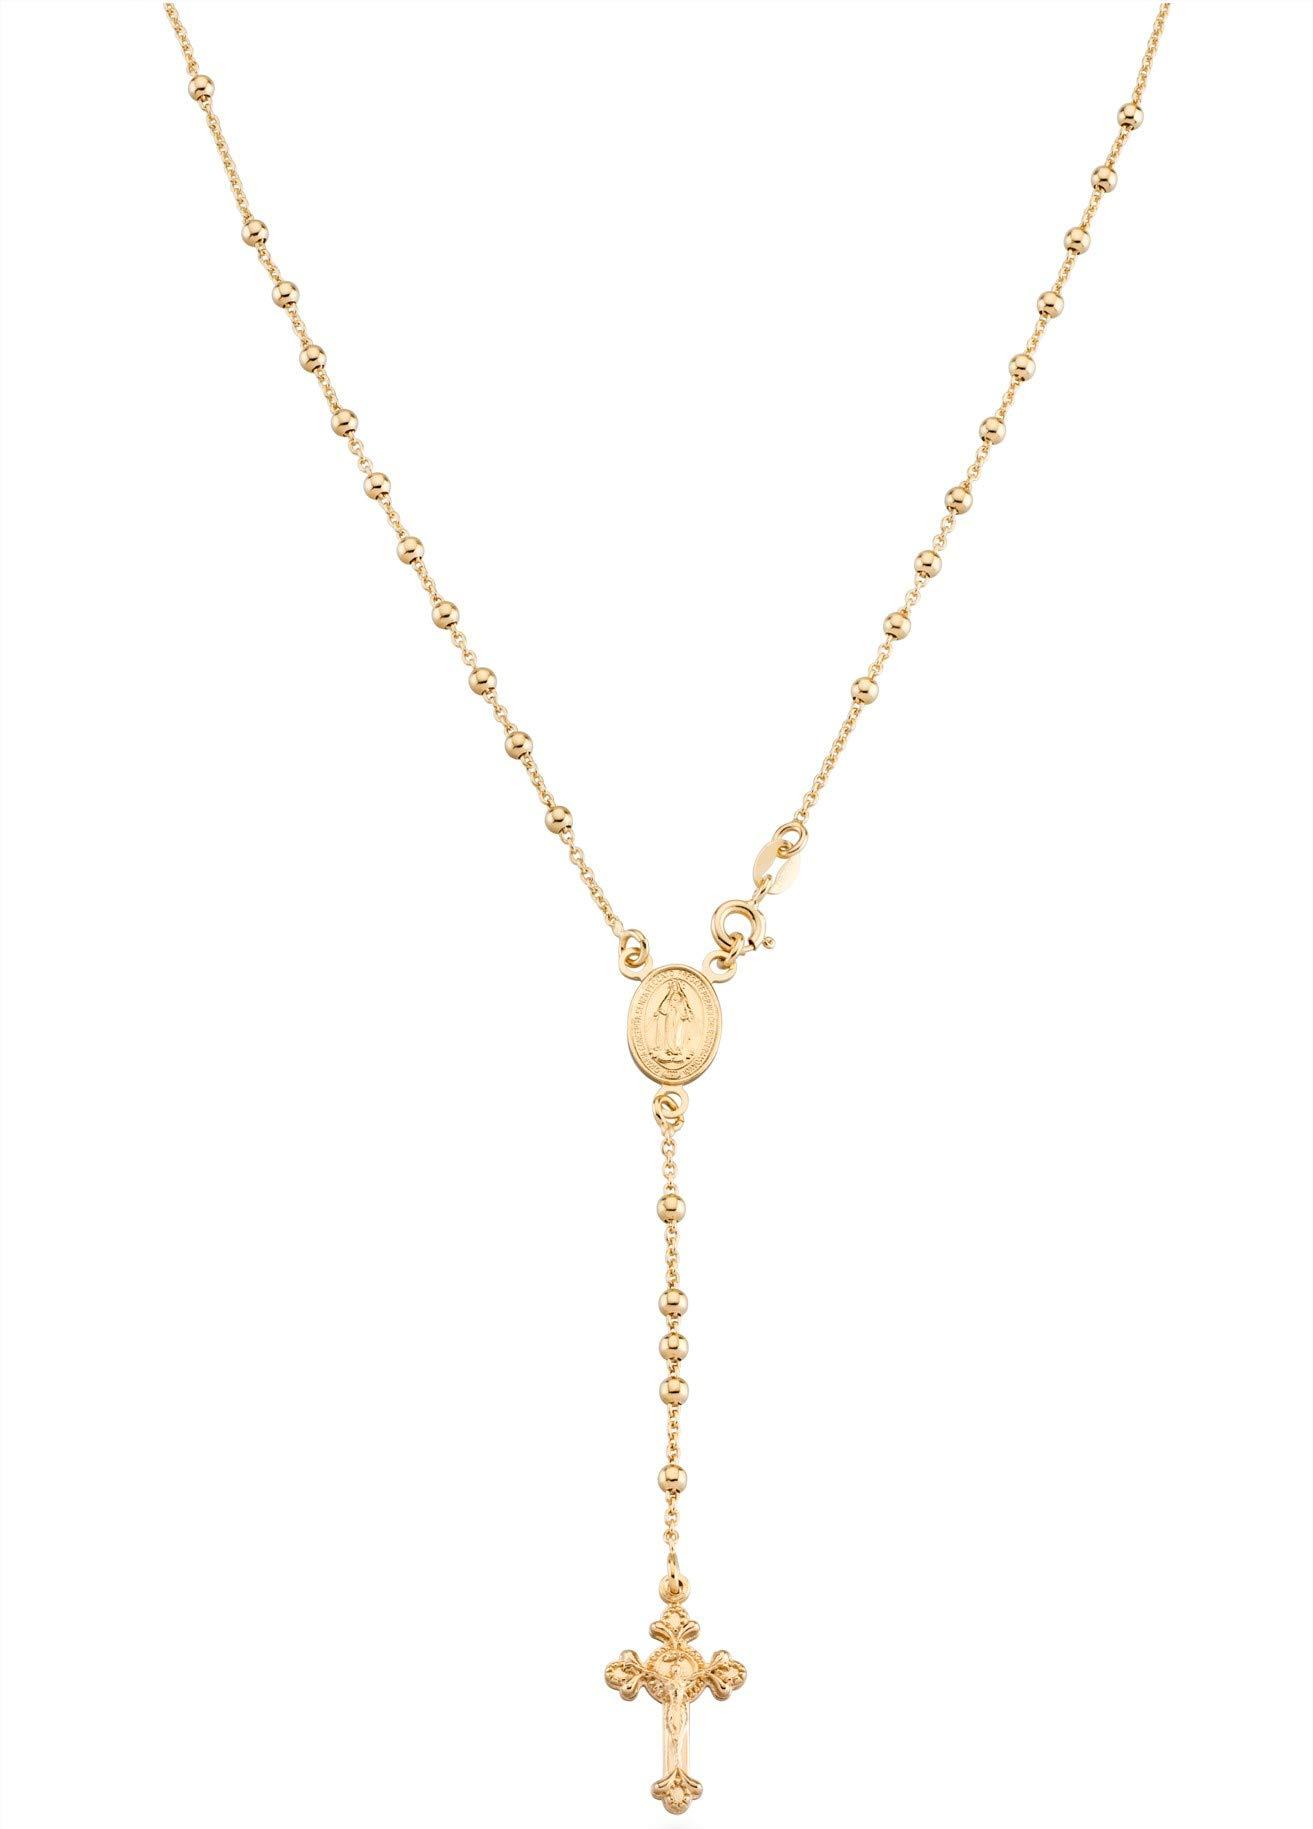 MiaBella 18K Gold Over Sterling Silver Italian Rosary Bead Cross Y Necklace Chain for Women Men, 20 Inch by MiaBella